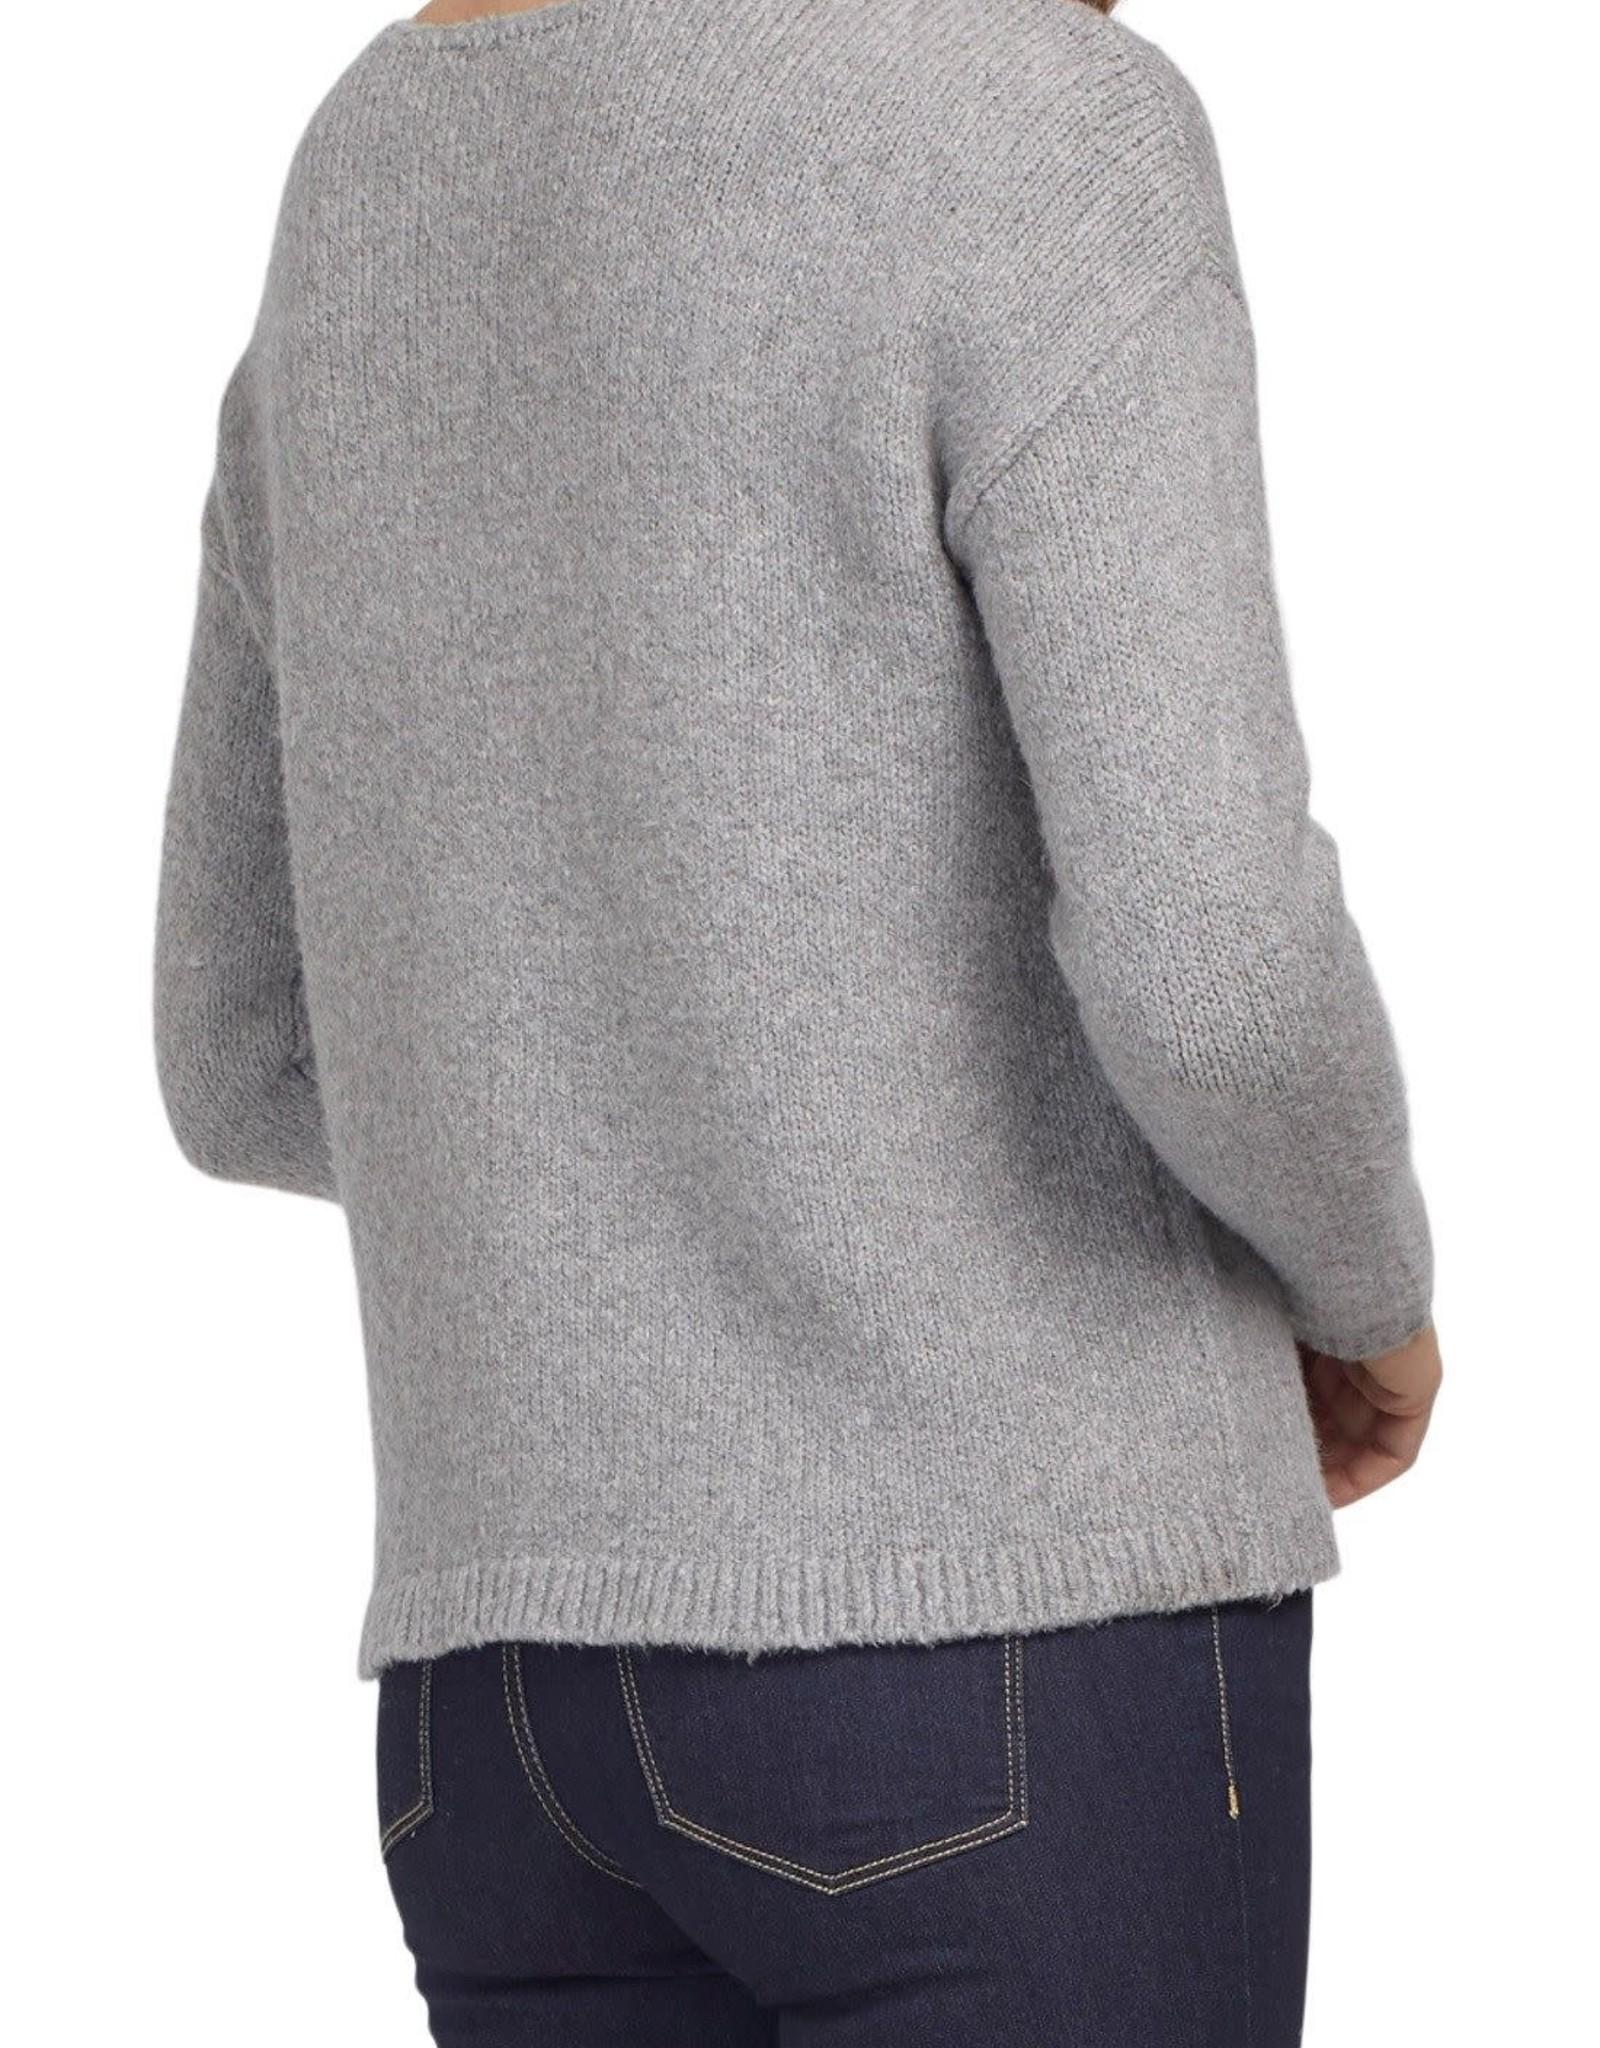 Tribal Tribal 7220O Long Sleeve Intarsia Sweater